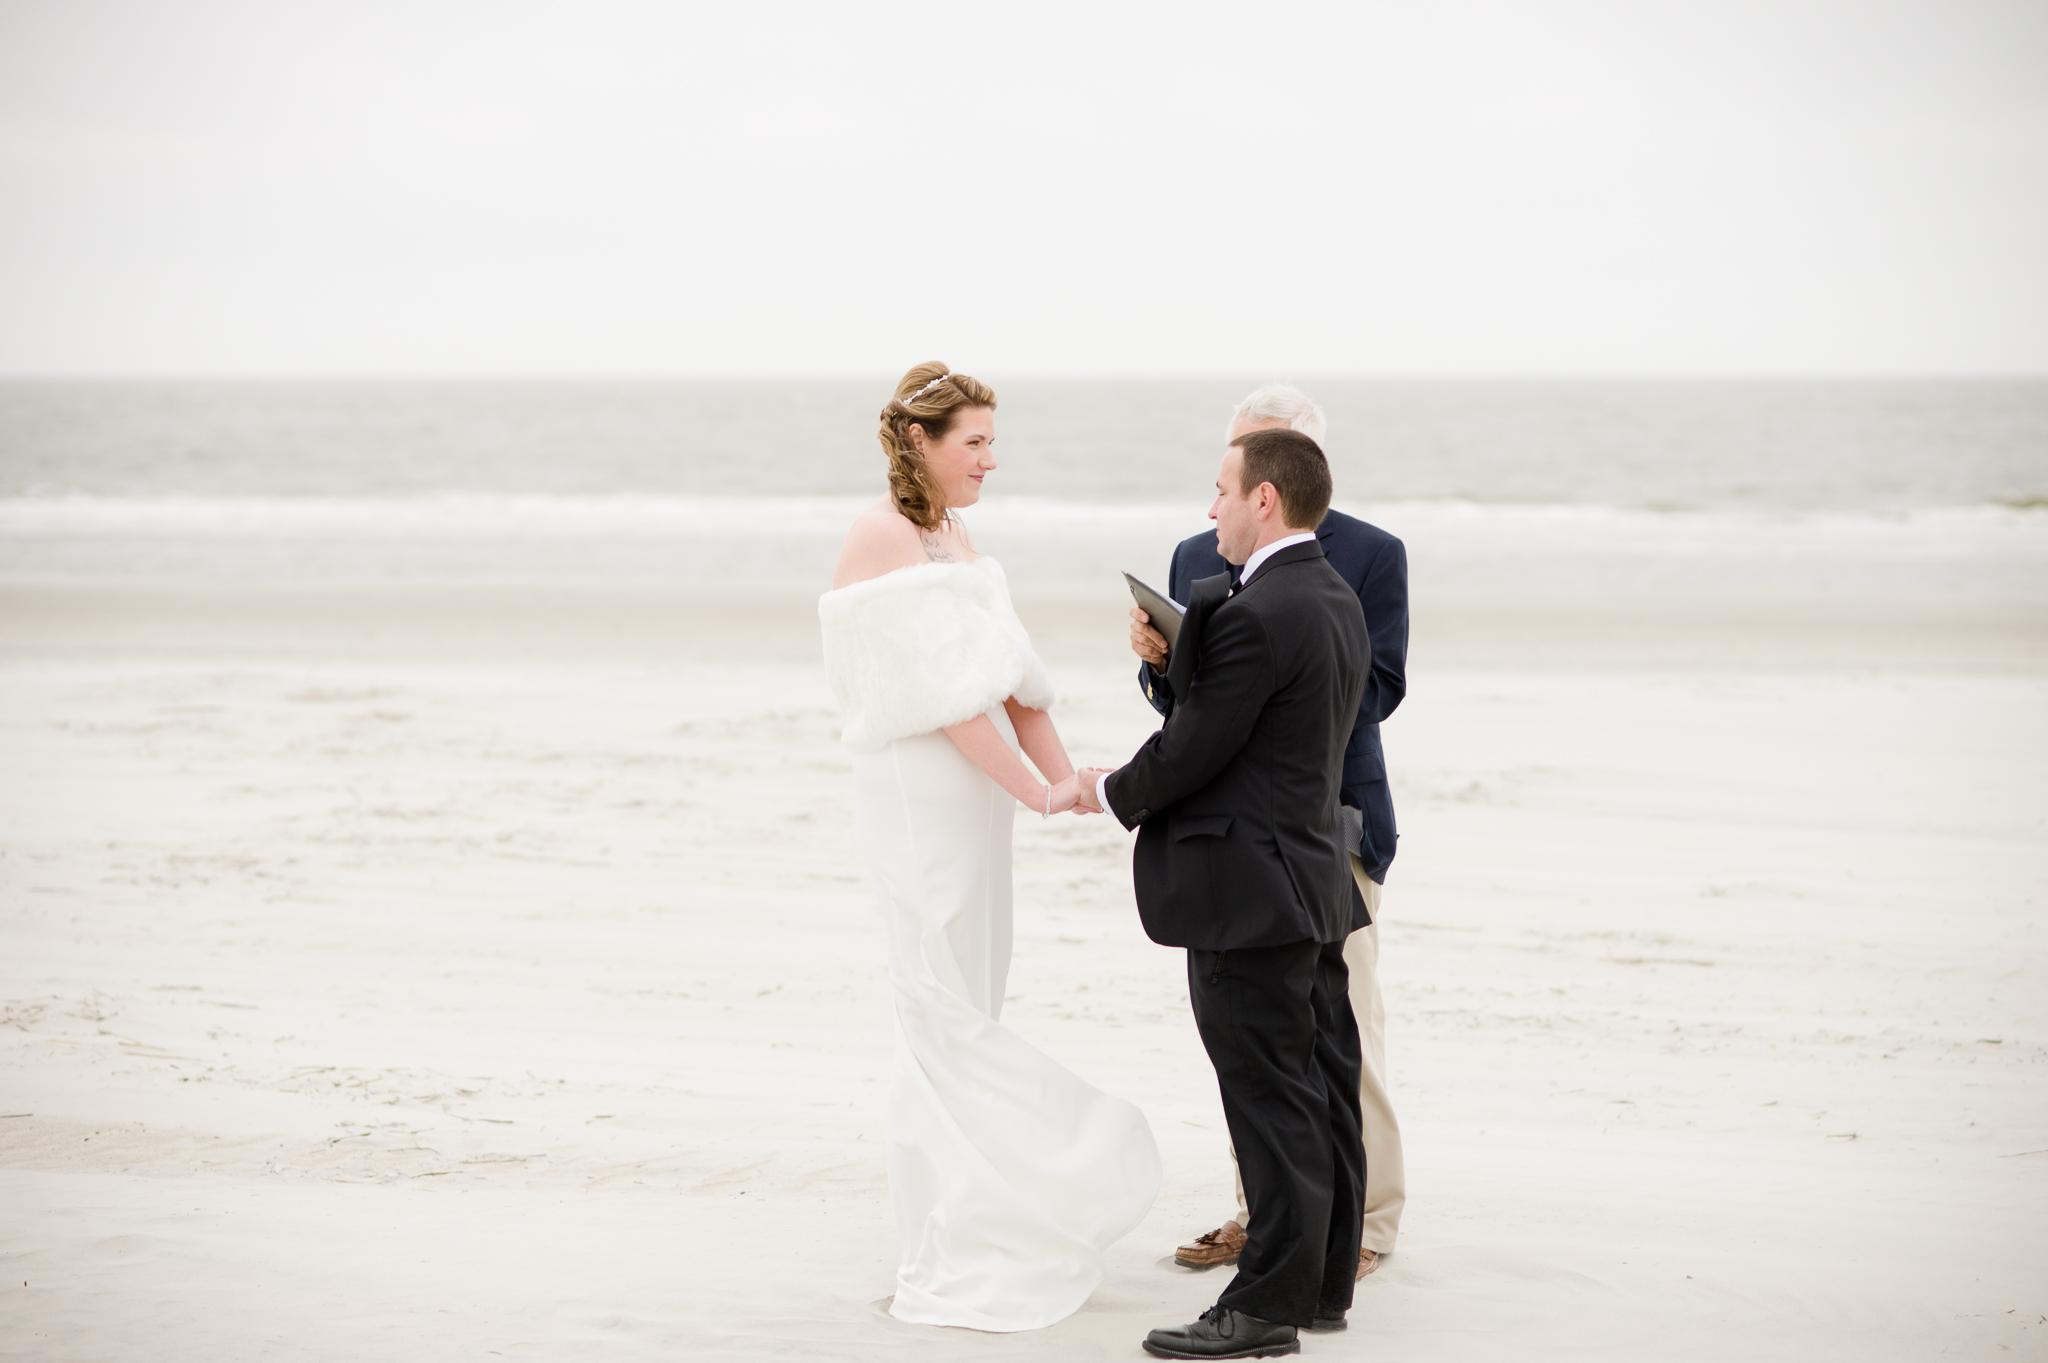 hilton+head+island+elopement-9808.JPG